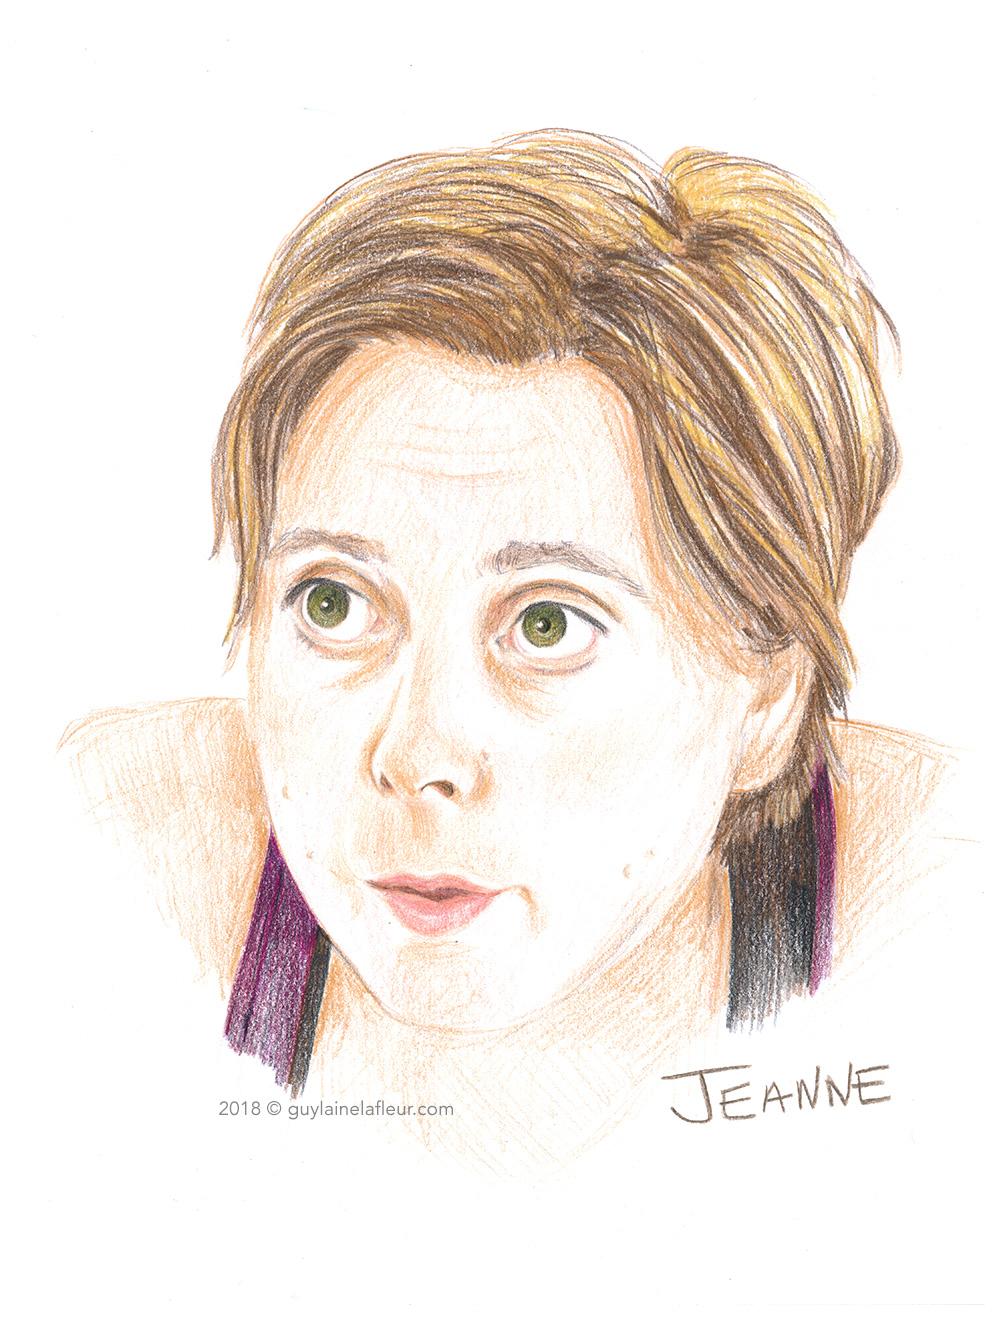 Jeanne  Biron - Eve Landry